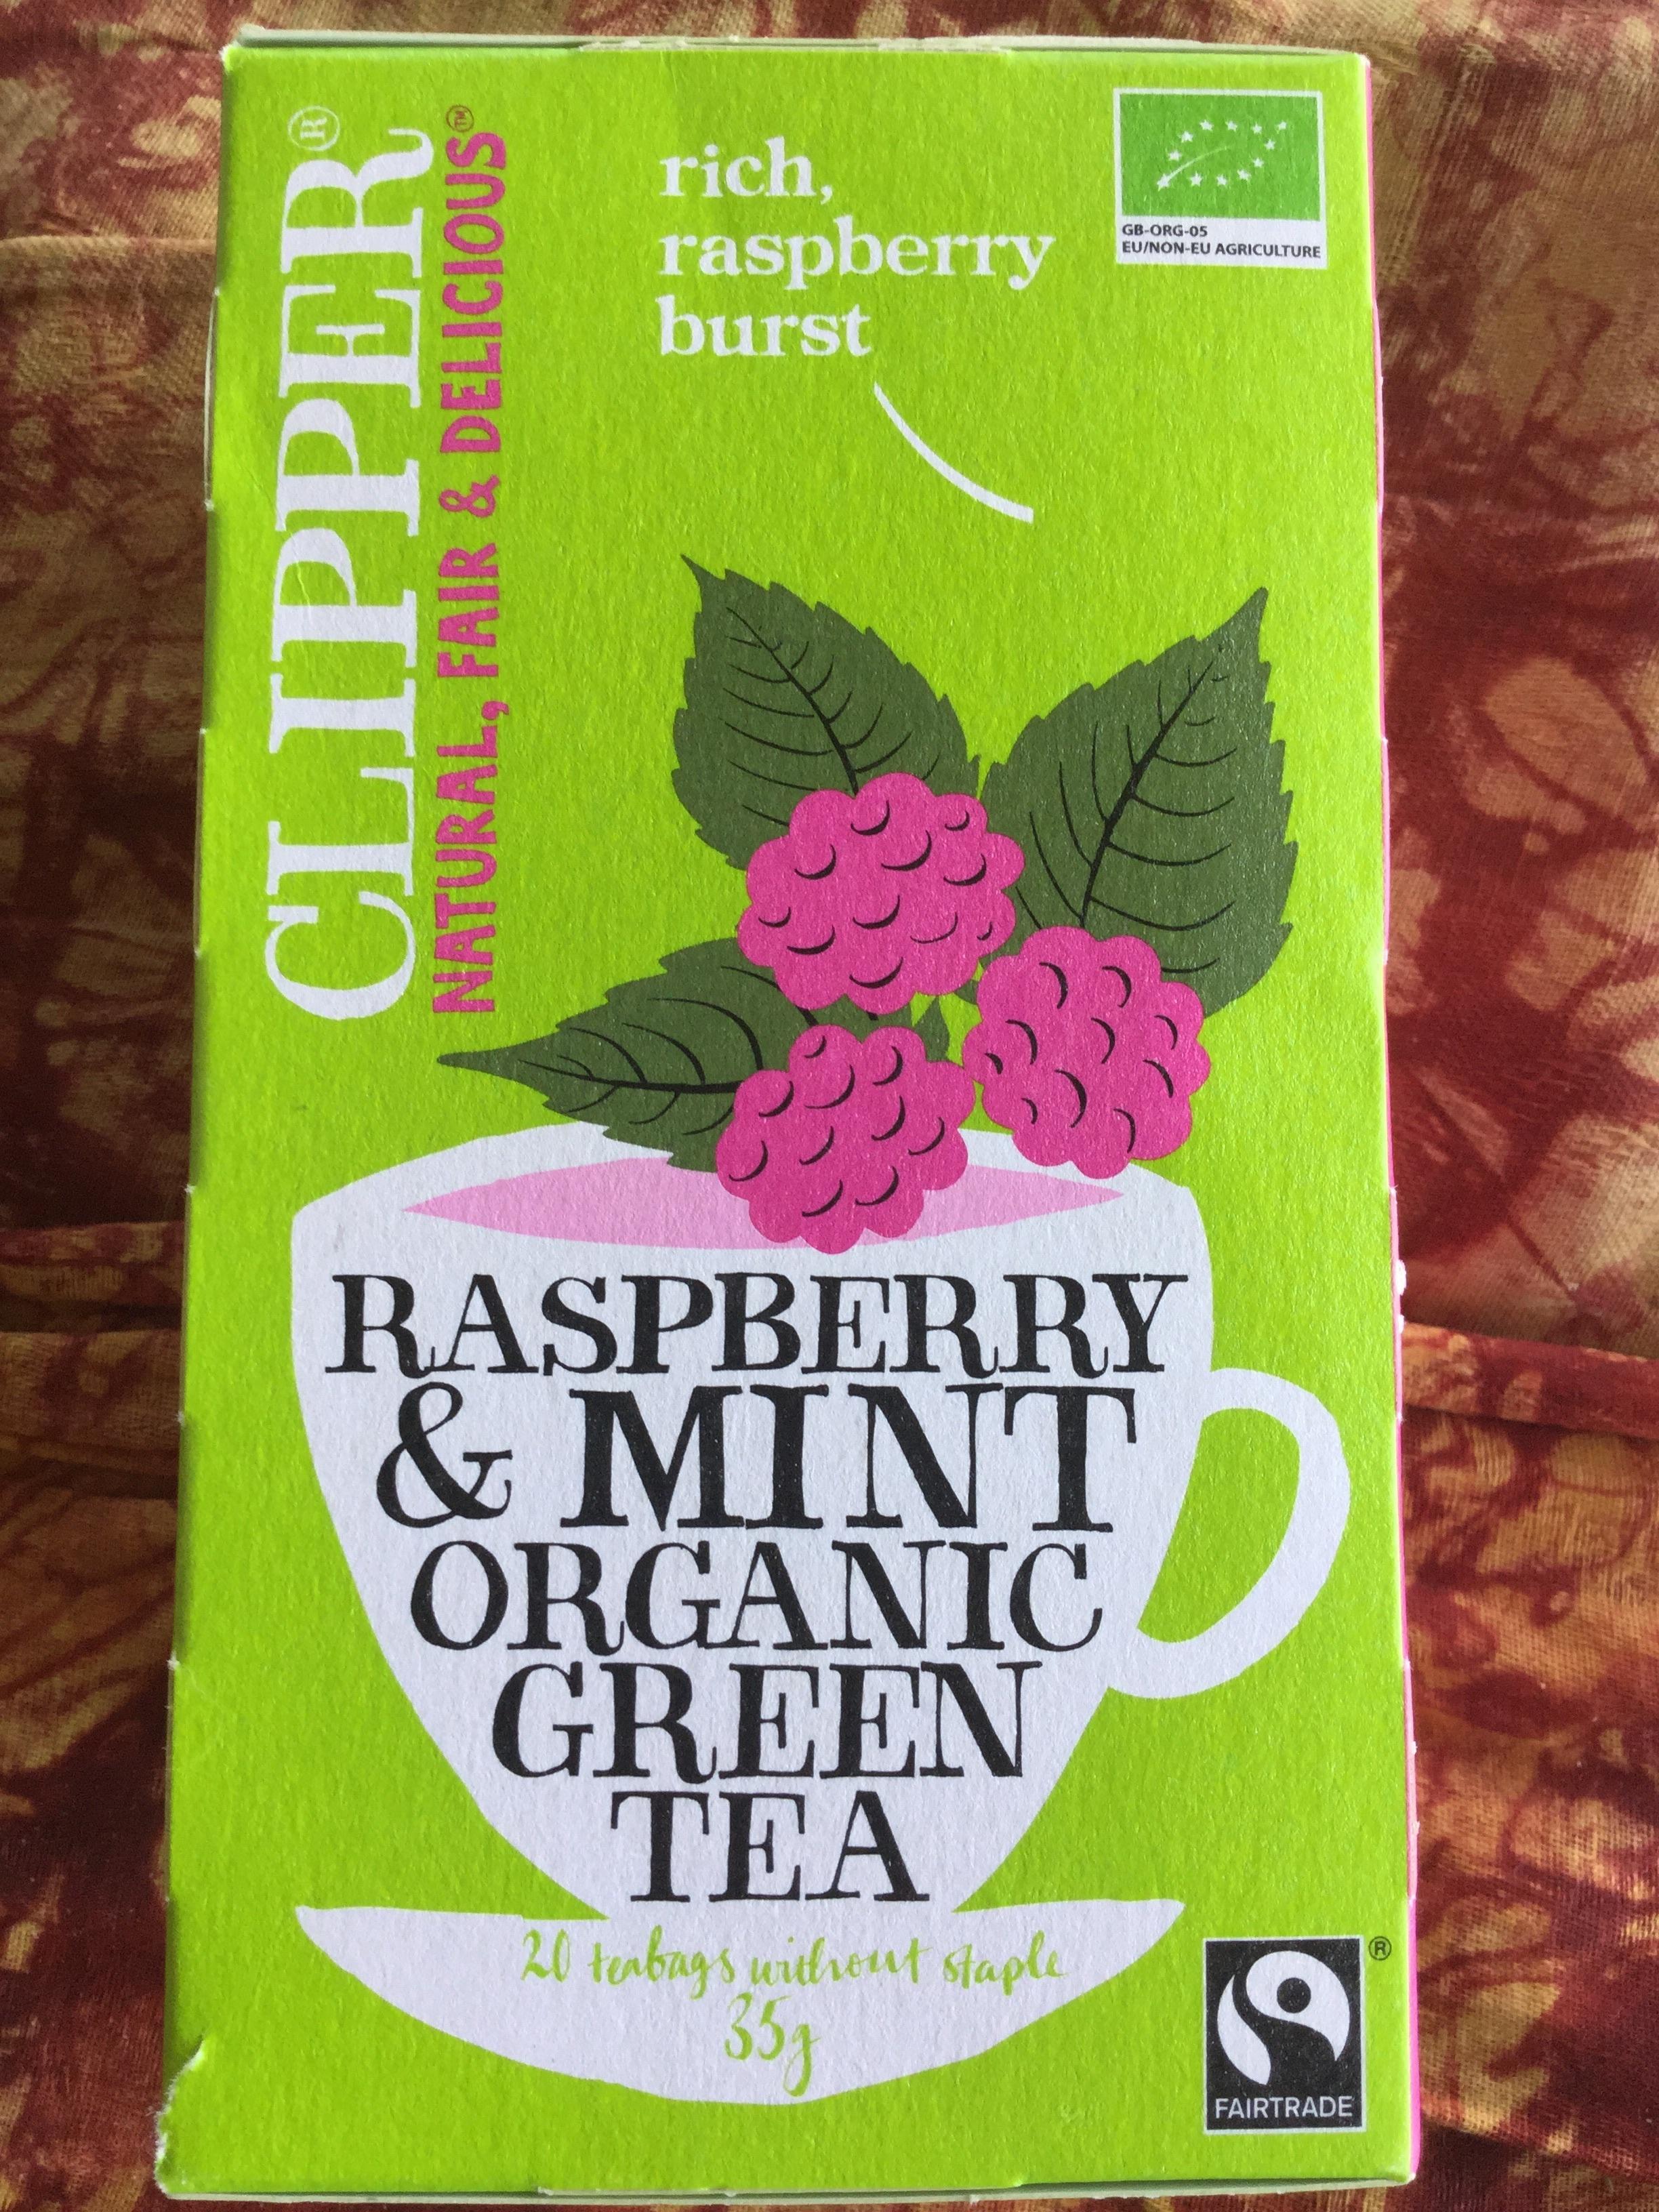 Raspberry & Mint Organic Green Tea - Product